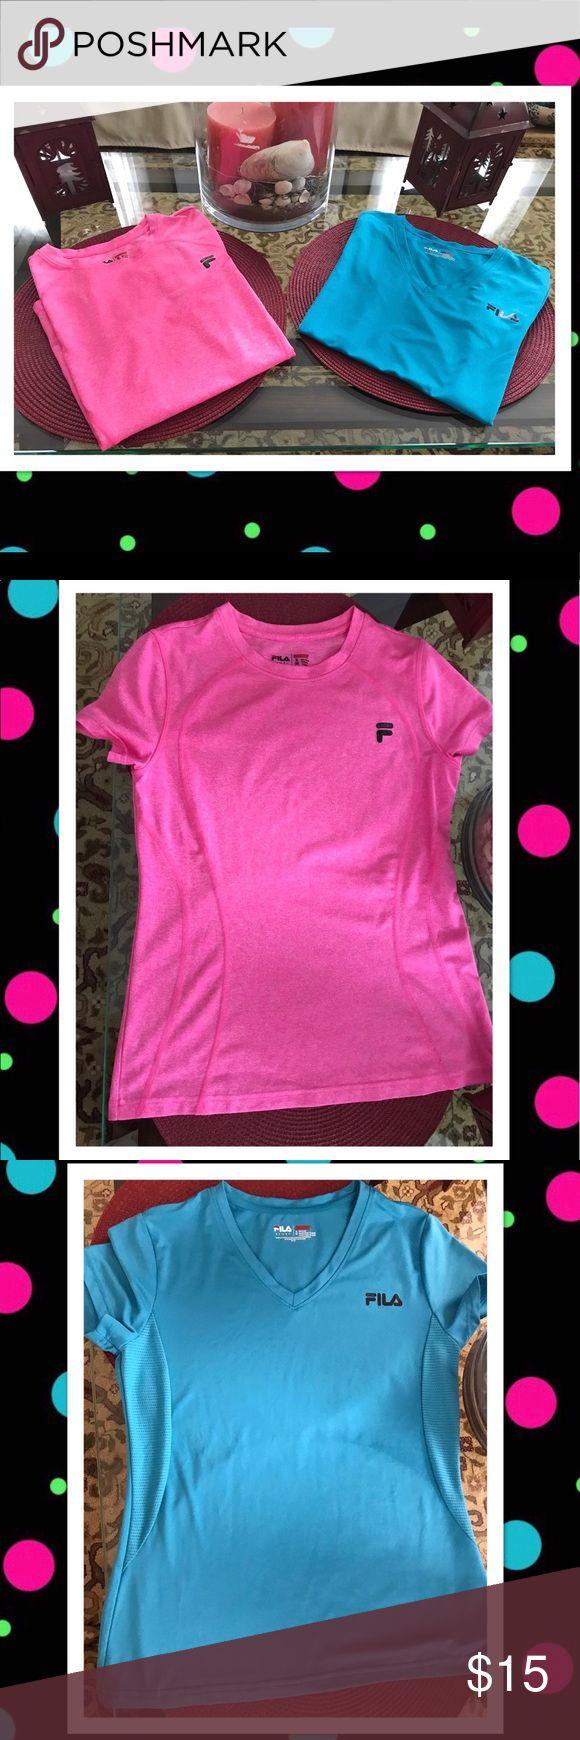 Design your own t shirt dublin - 25 Best Ideas About Cut Workout Shirts On Pinterest Diy Shirt Cutting Tank Top Diy Tank And Cut Clothes